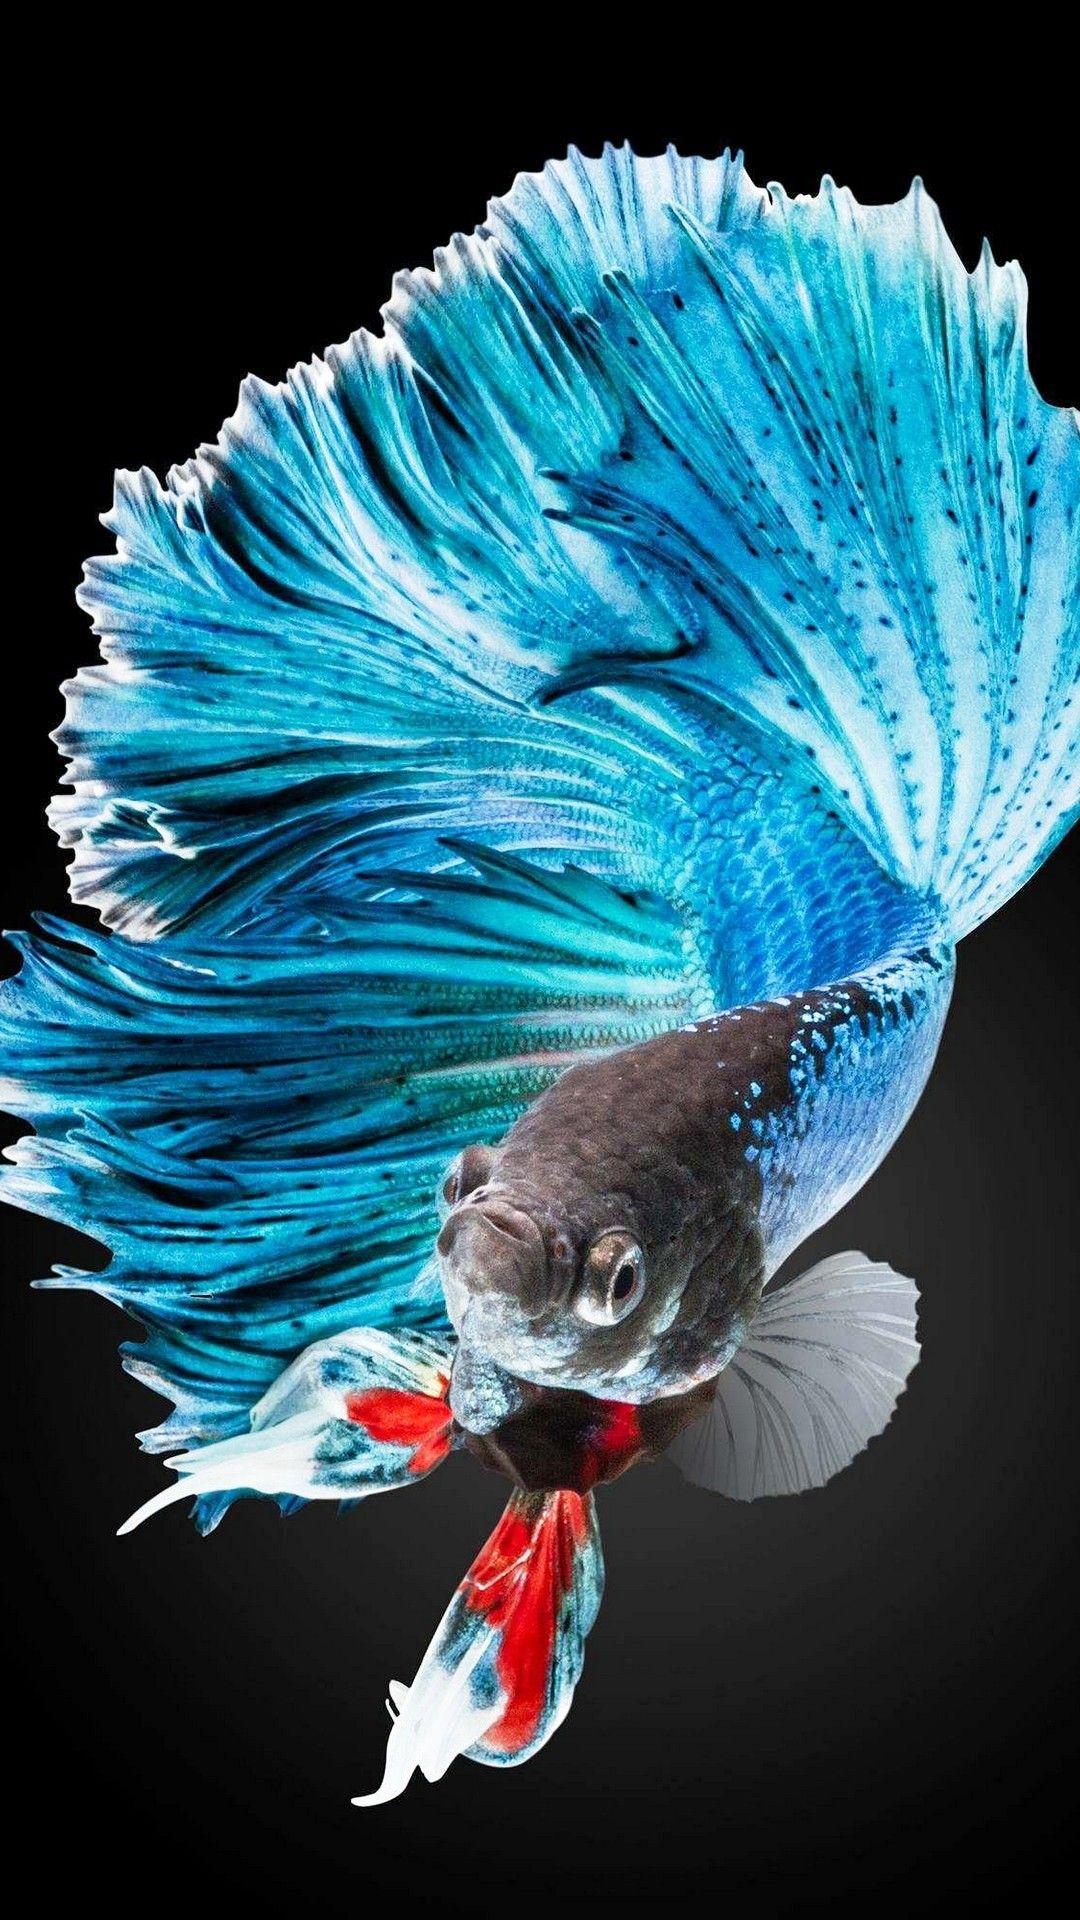 Iphone 6s Plus Screen Lock Wallpaper Beta Fish Betta Fish